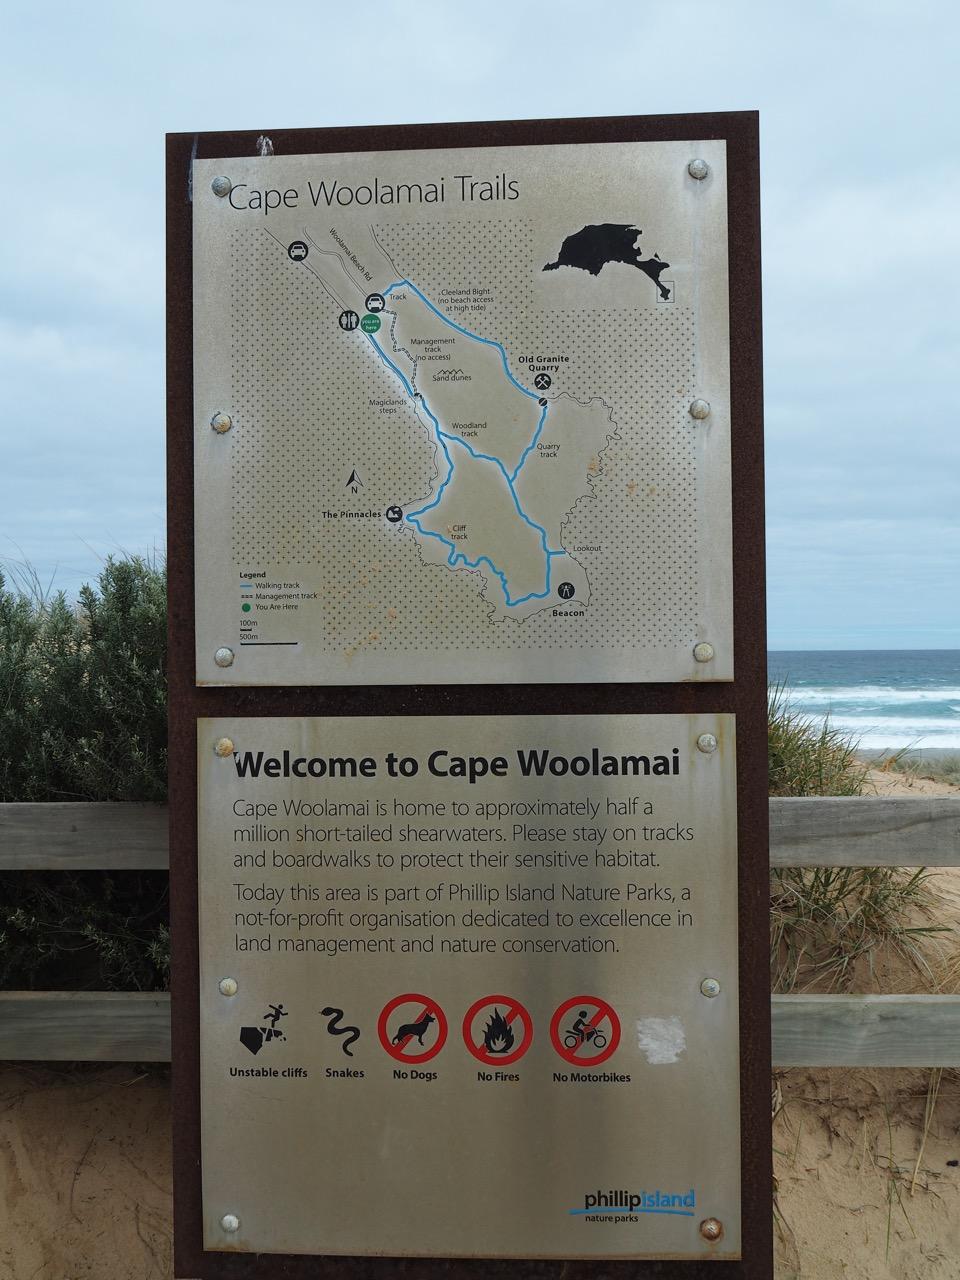 A map of Cape Woolamai's hiking trails.